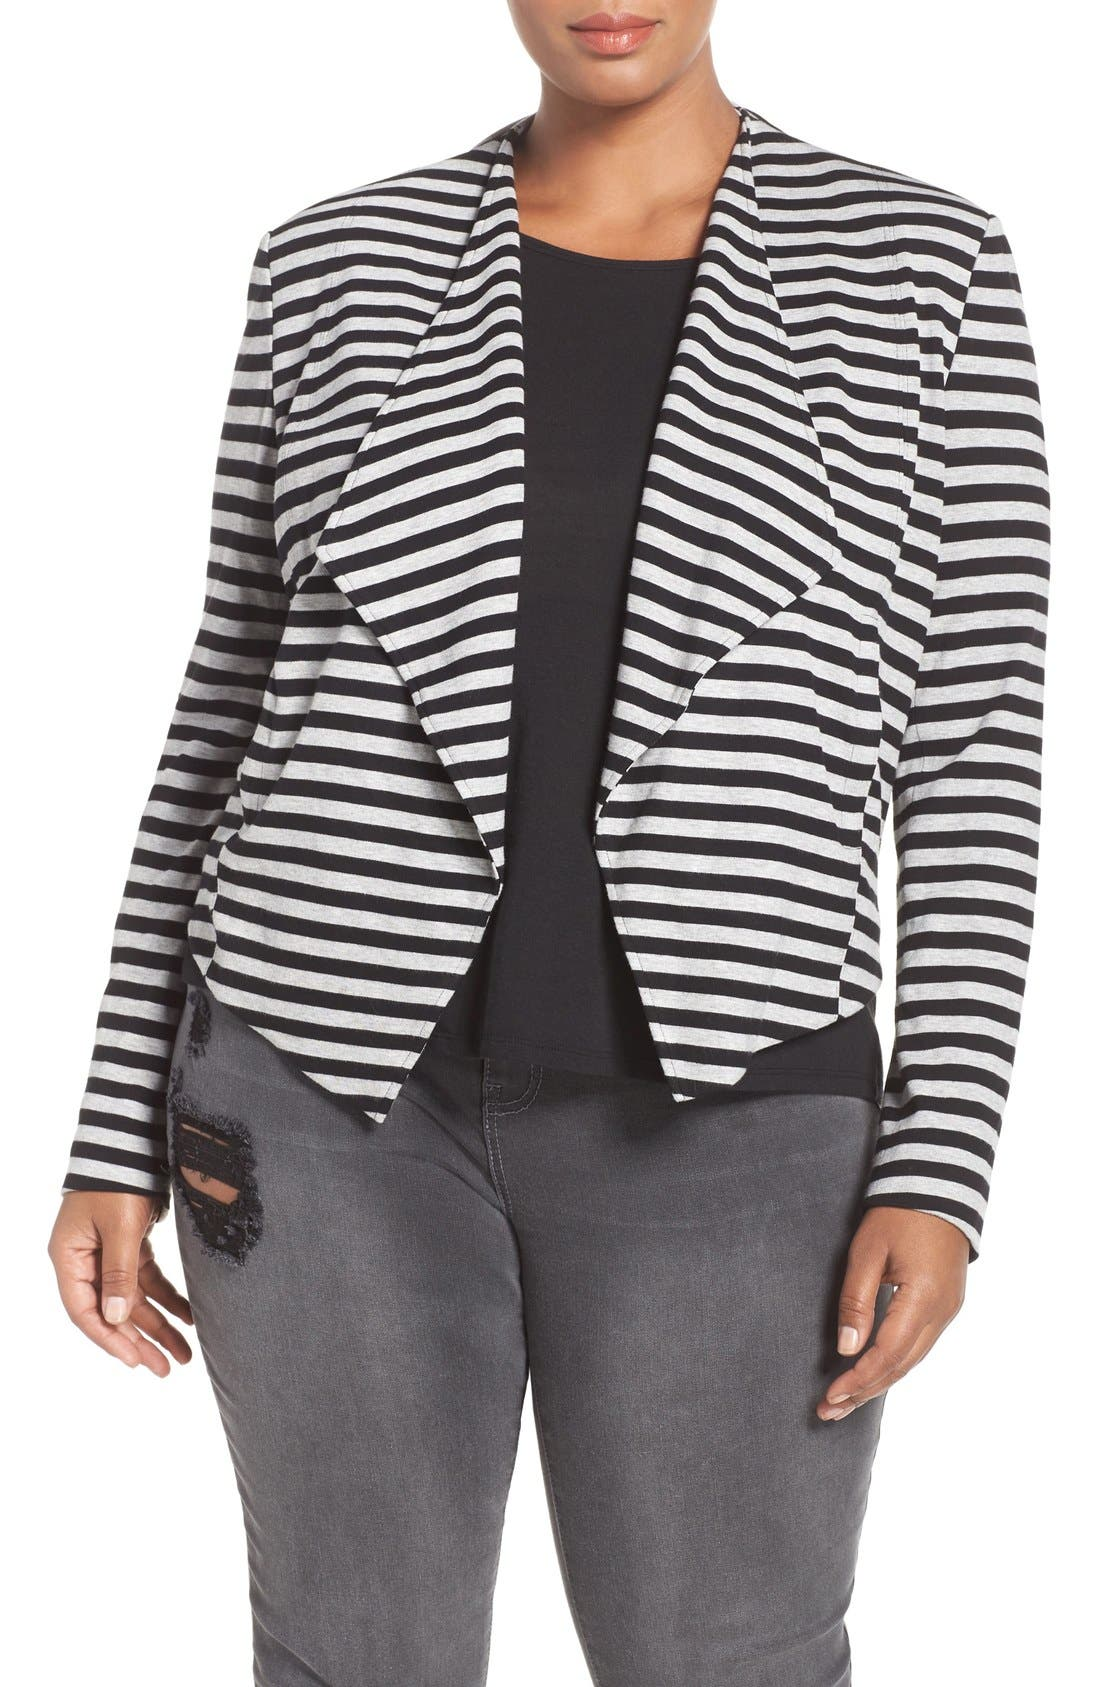 'Veronicka' Stripe Knit Open Front Jacket,                             Main thumbnail 1, color,                             Black/ Heather Grey Stripe